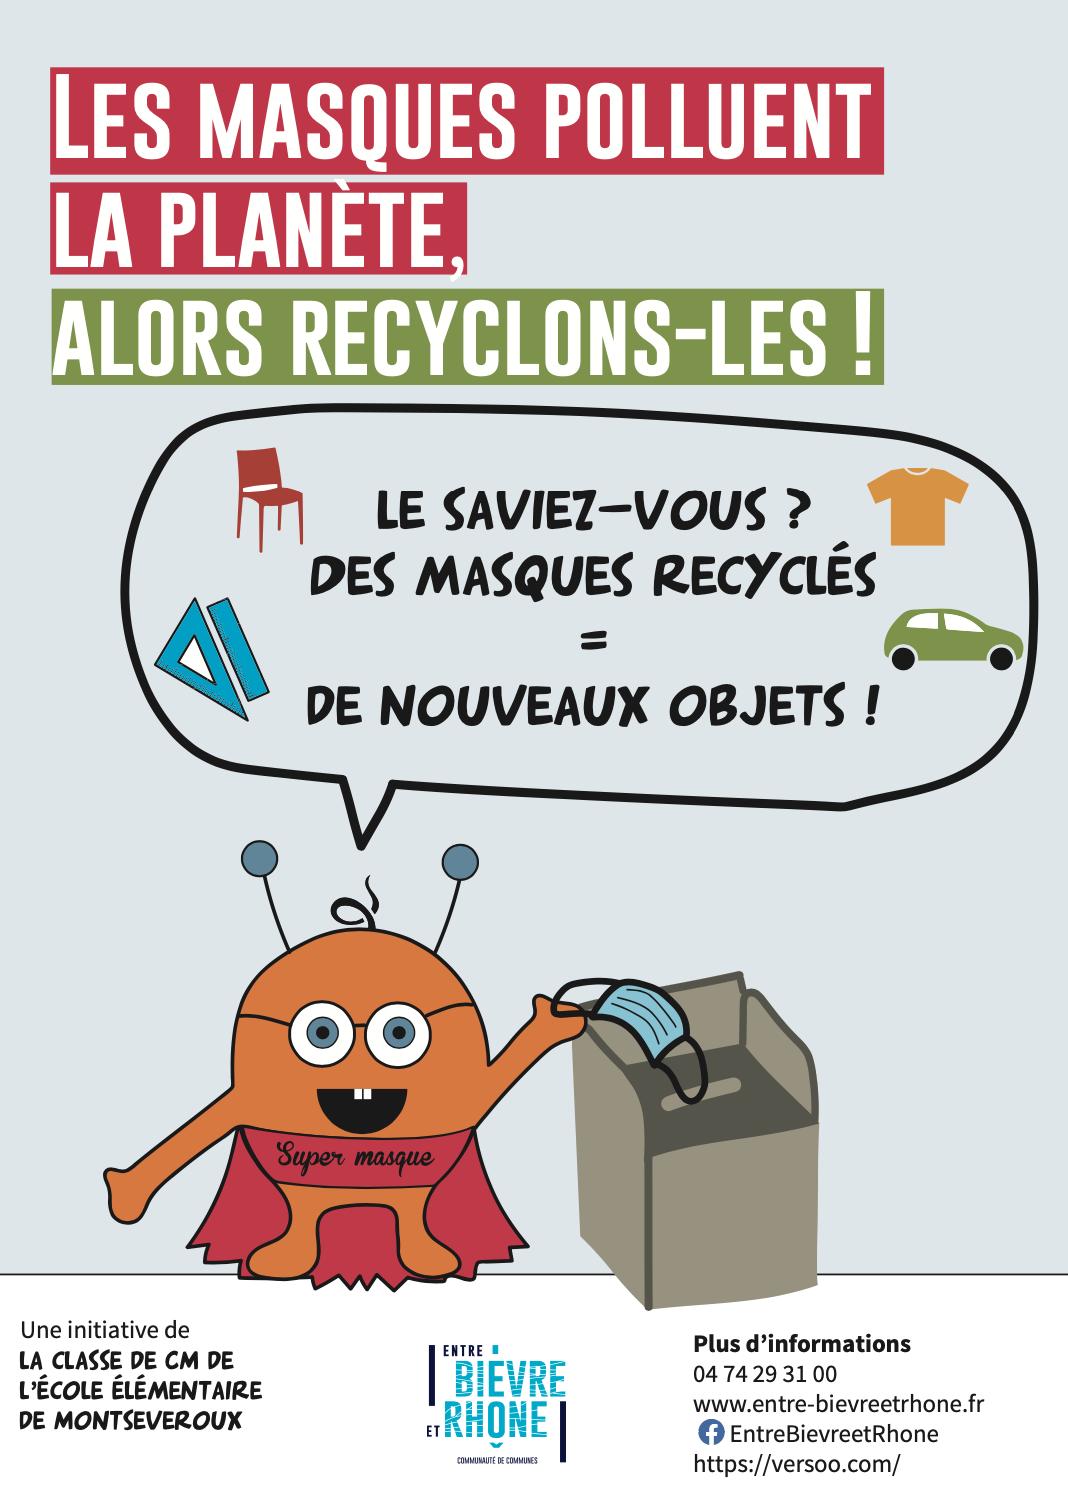 Recyclagemasuqes.png